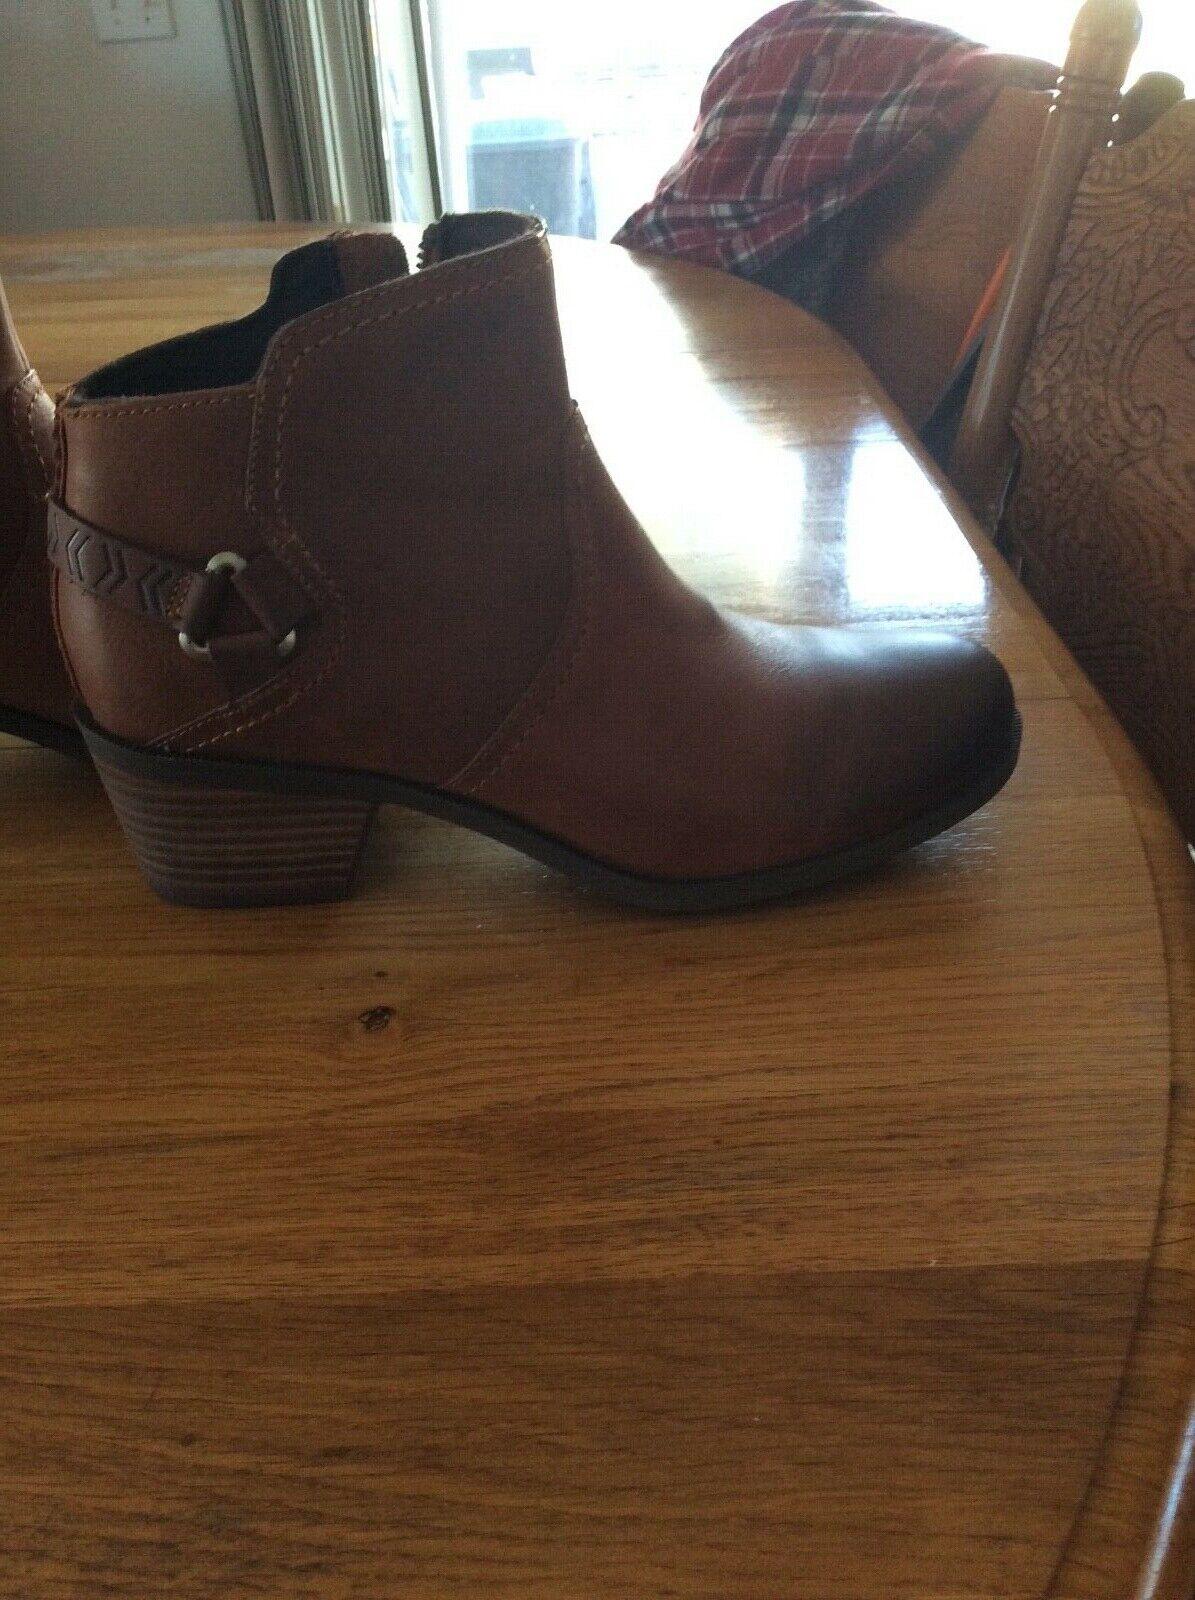 Teva Women's short boots, size 8